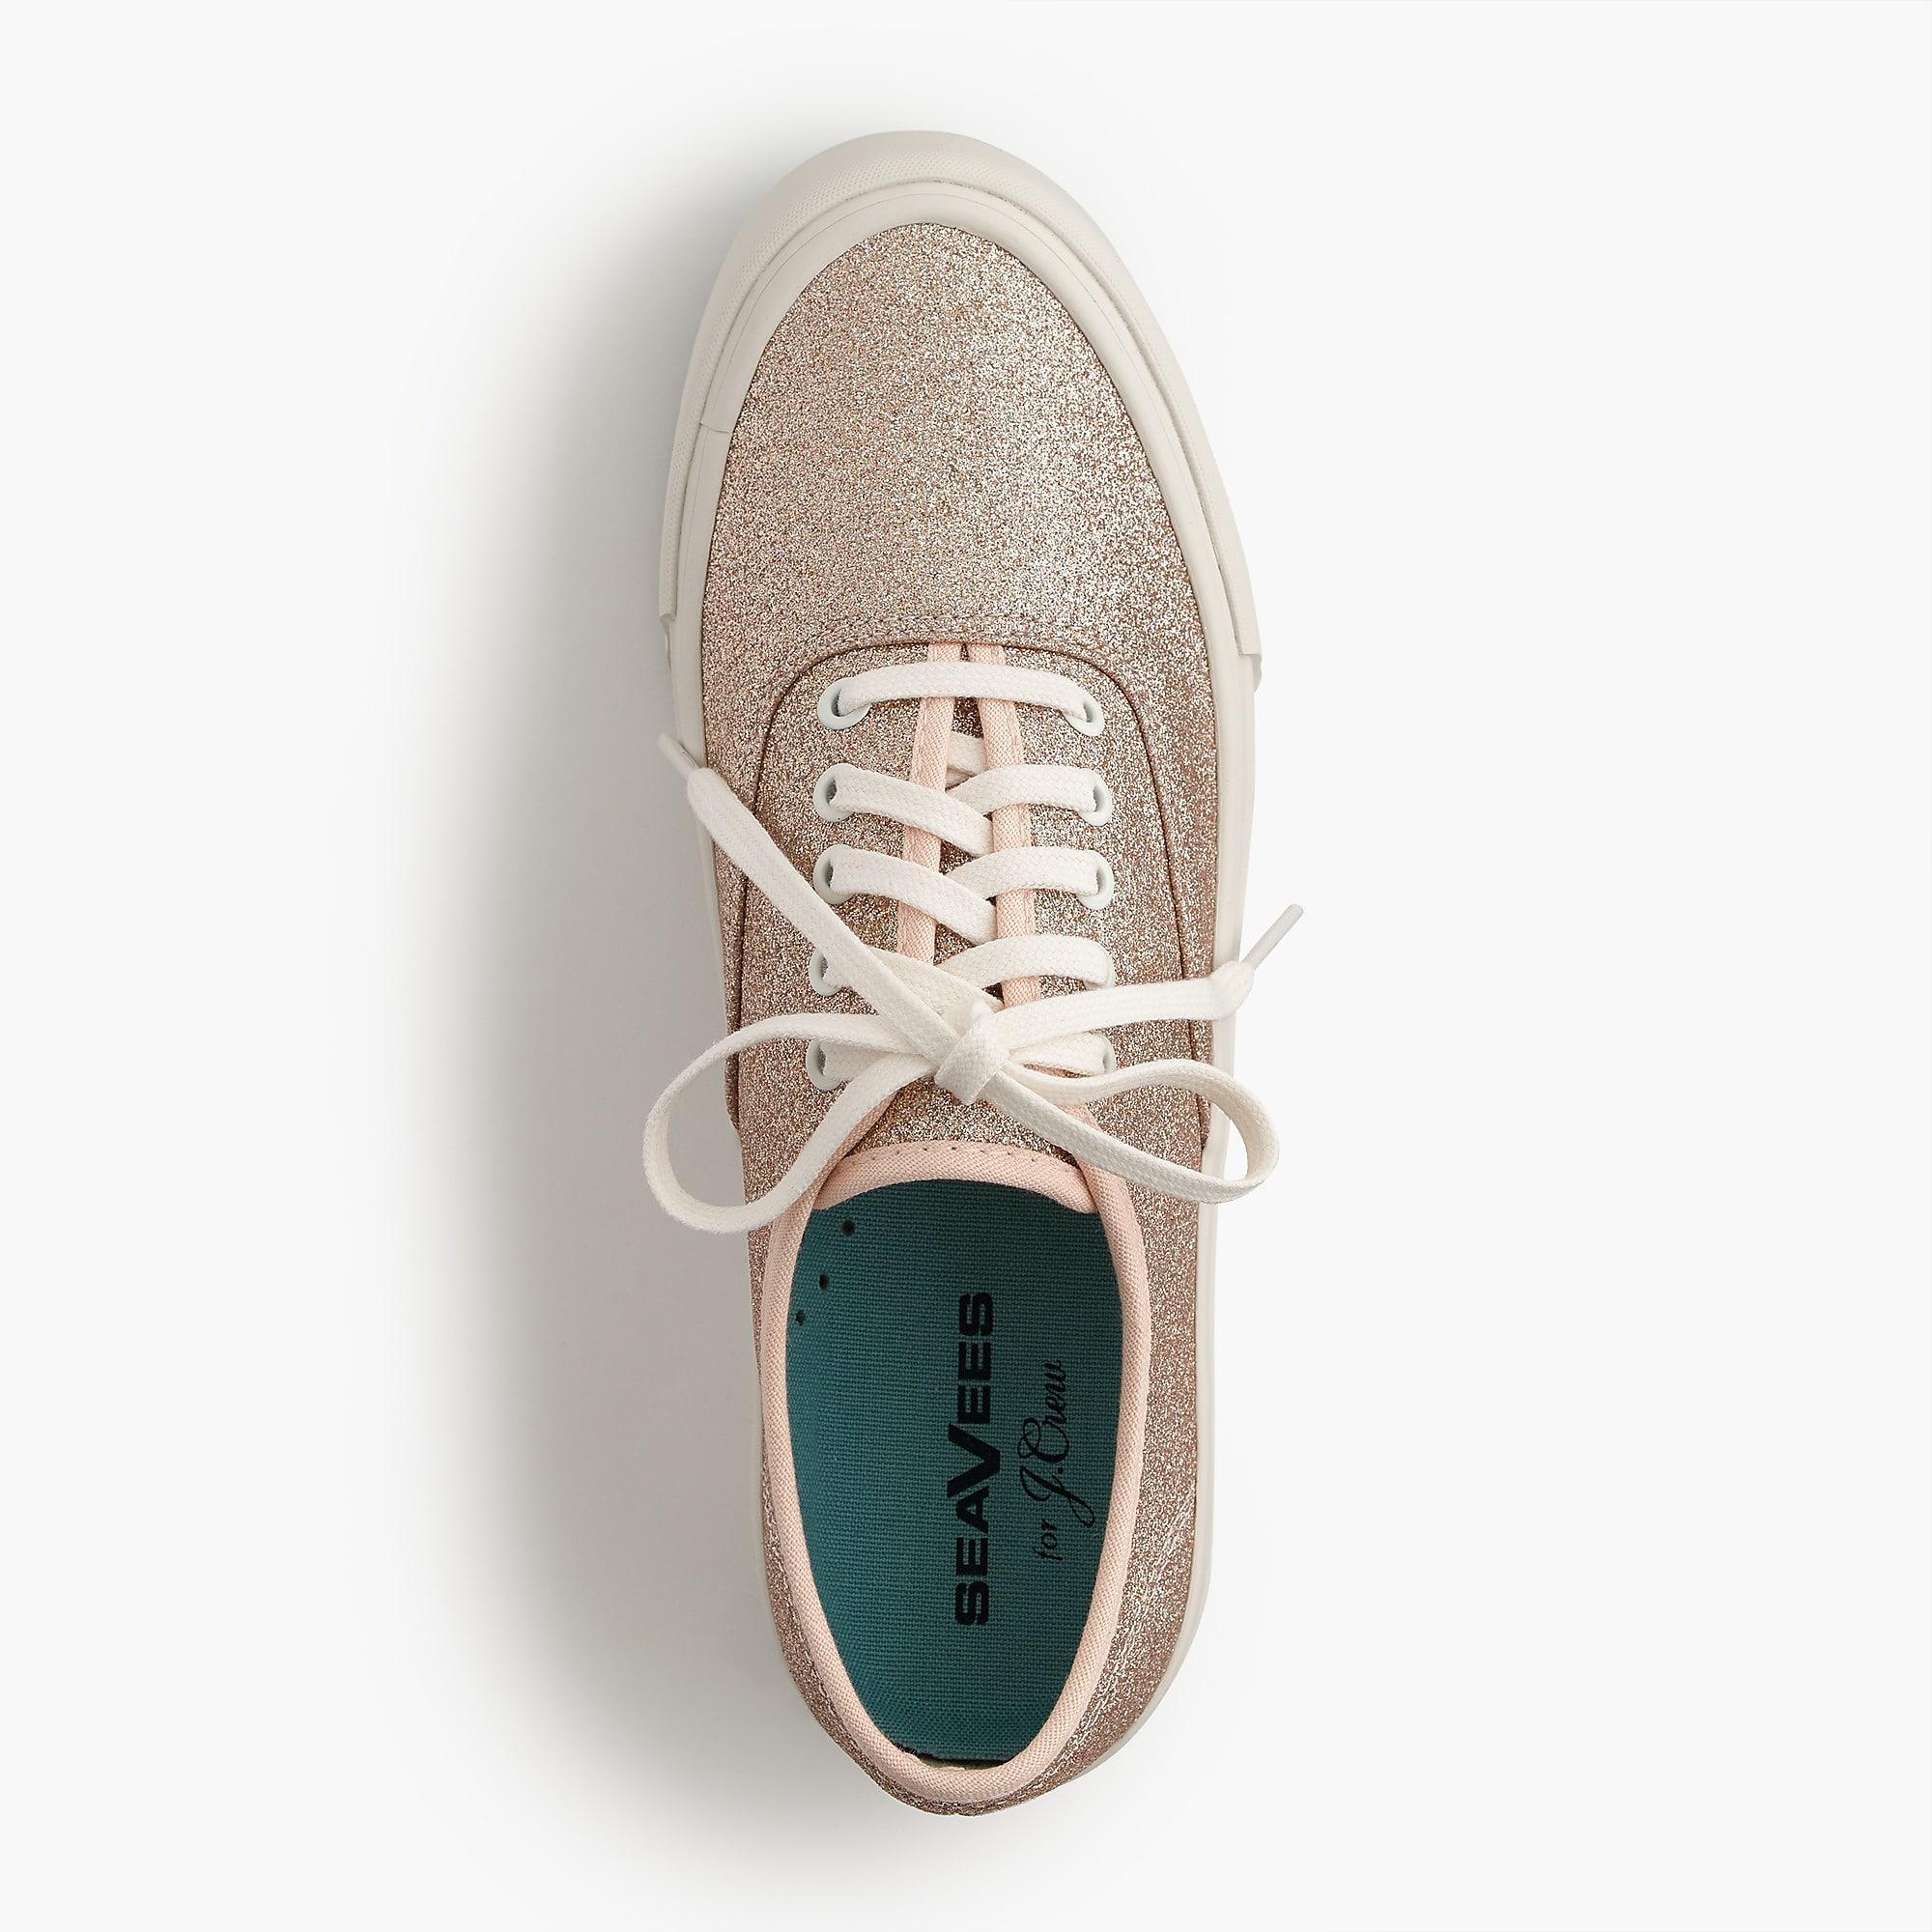 Seavees Cotton Legend Sneakers In